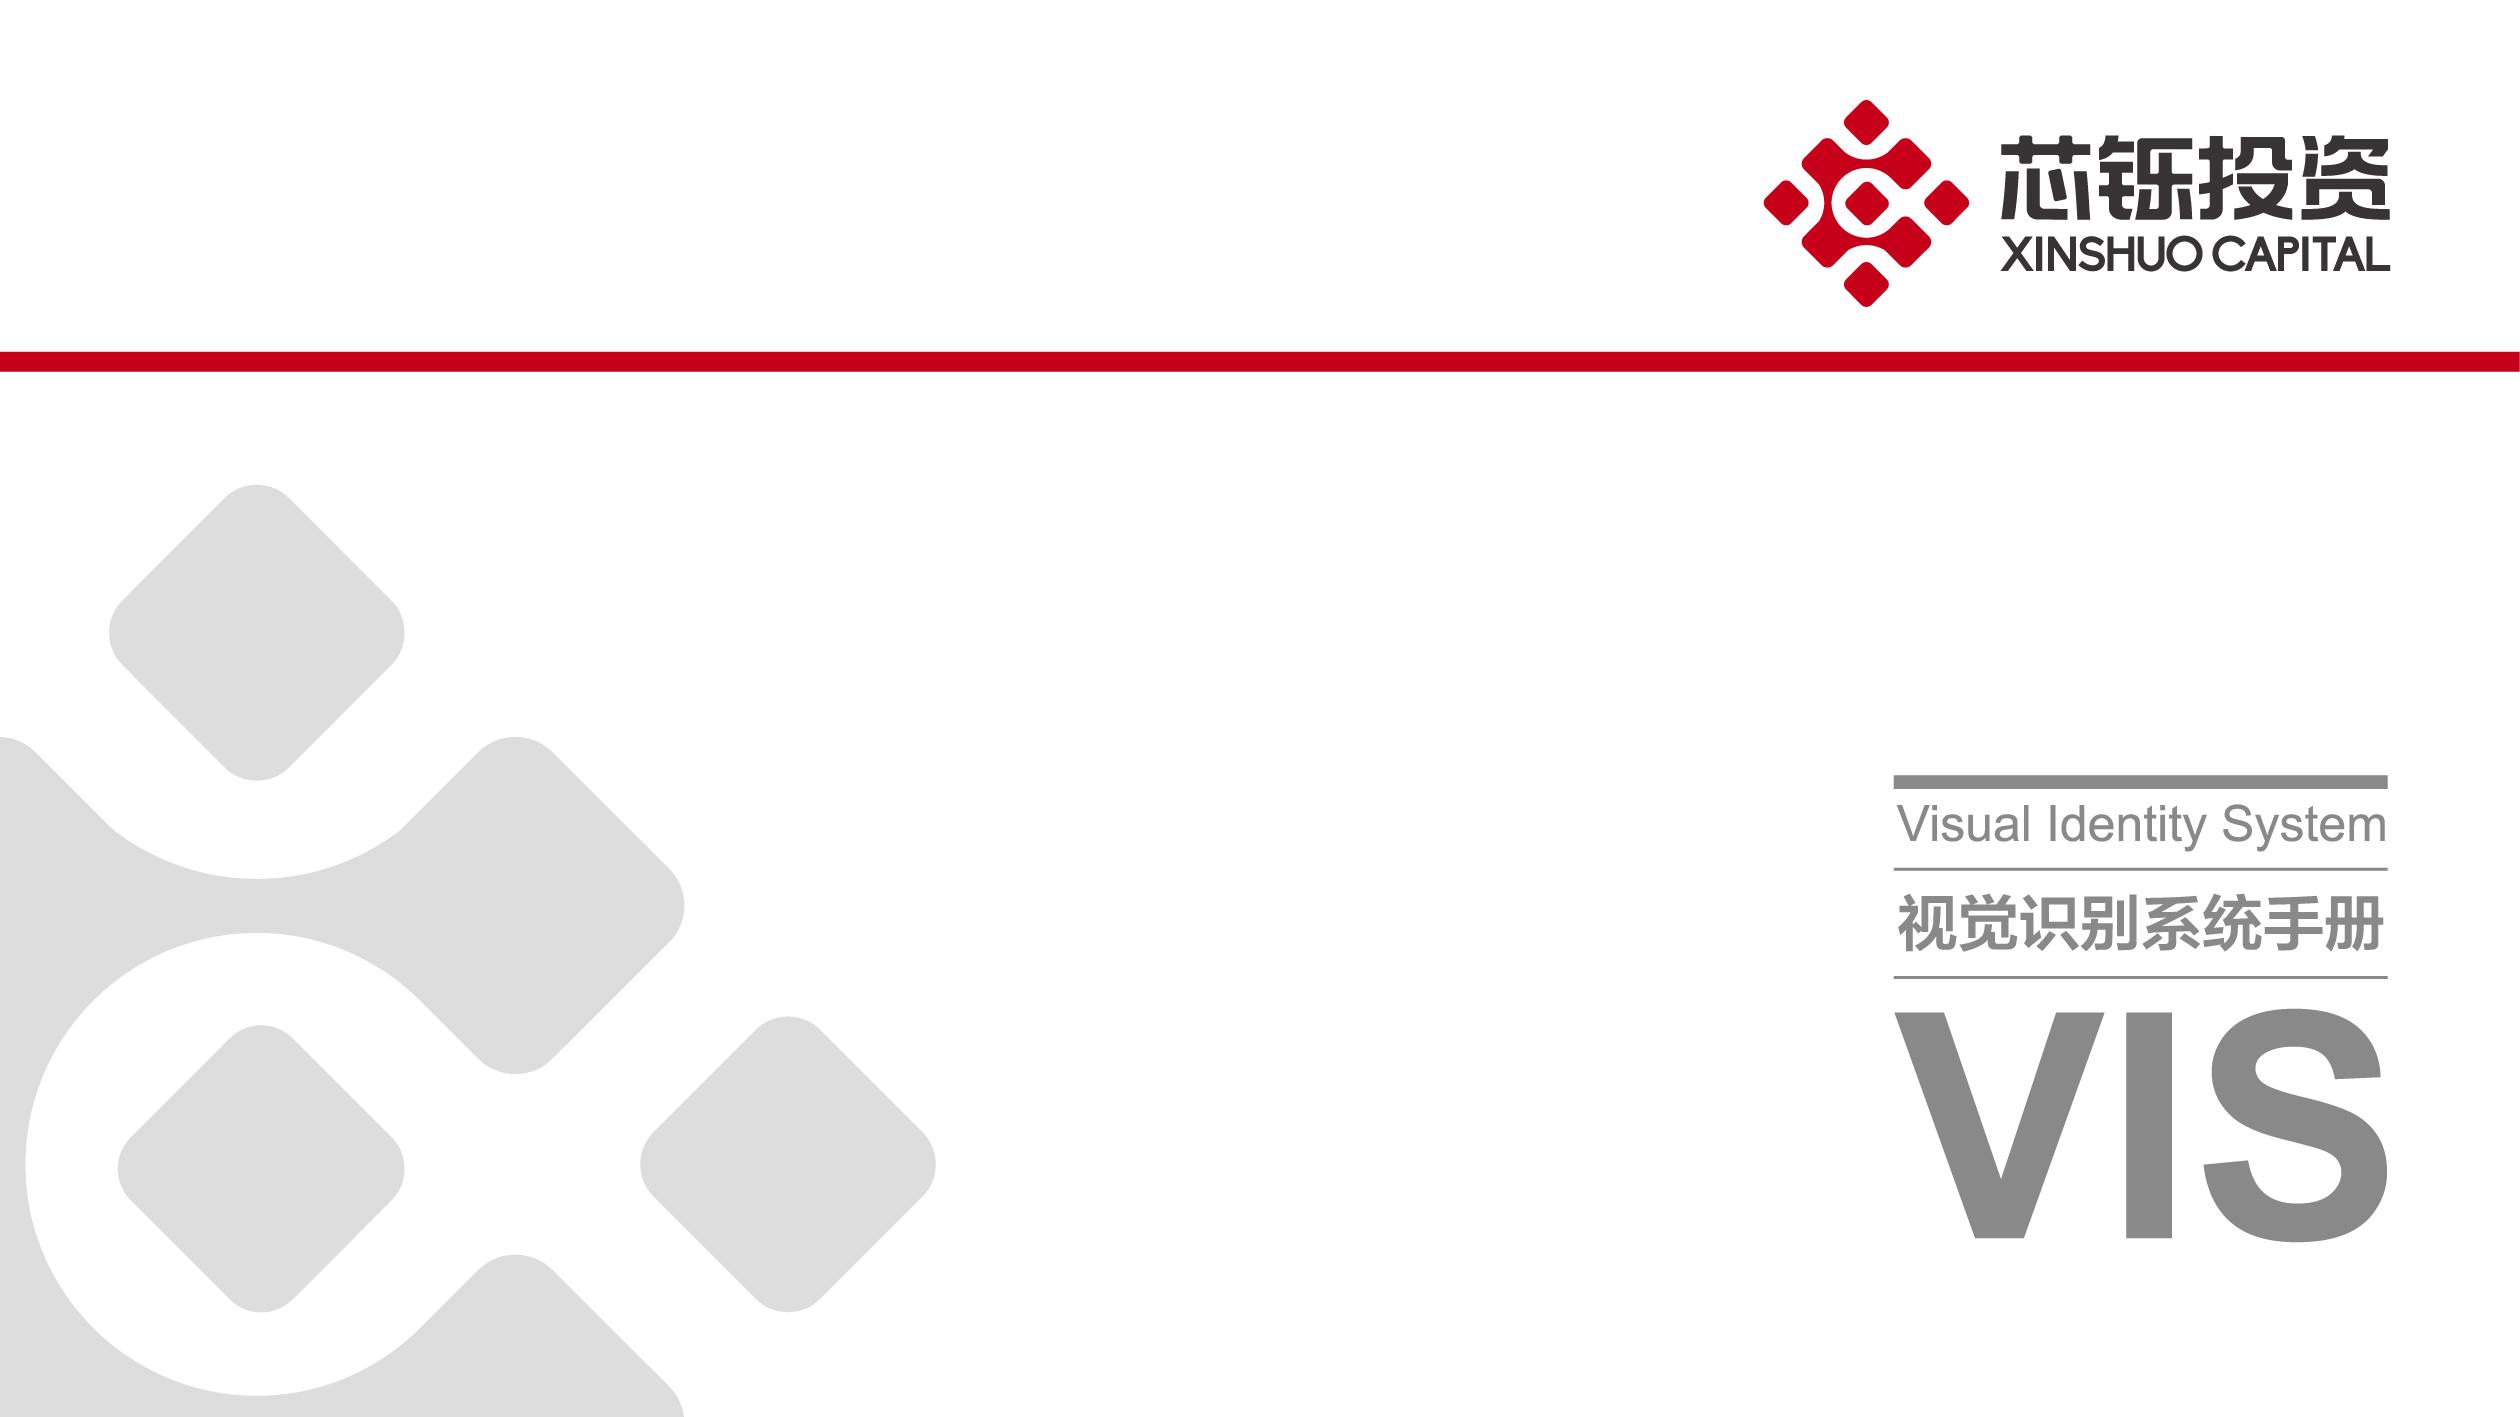 芯铄投资VI设计